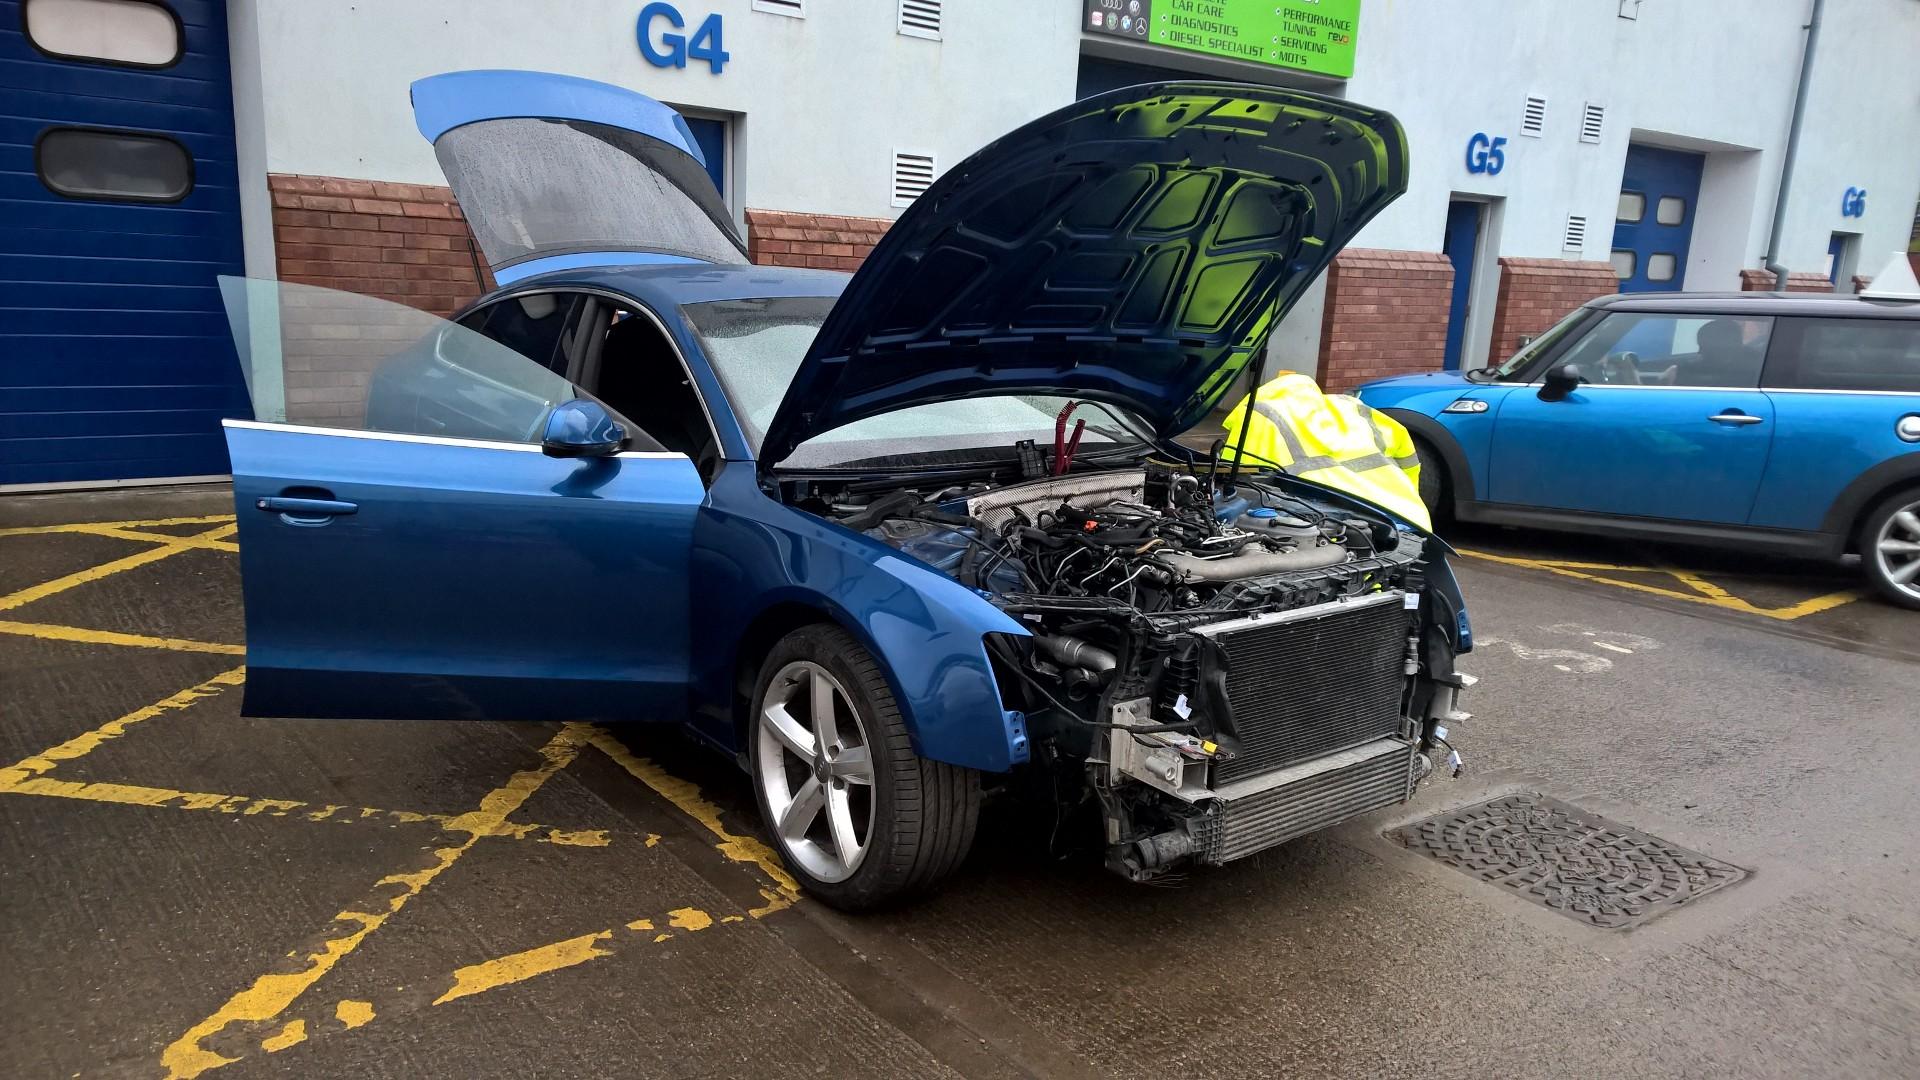 Accident damaged Audi A5 repair part 1.